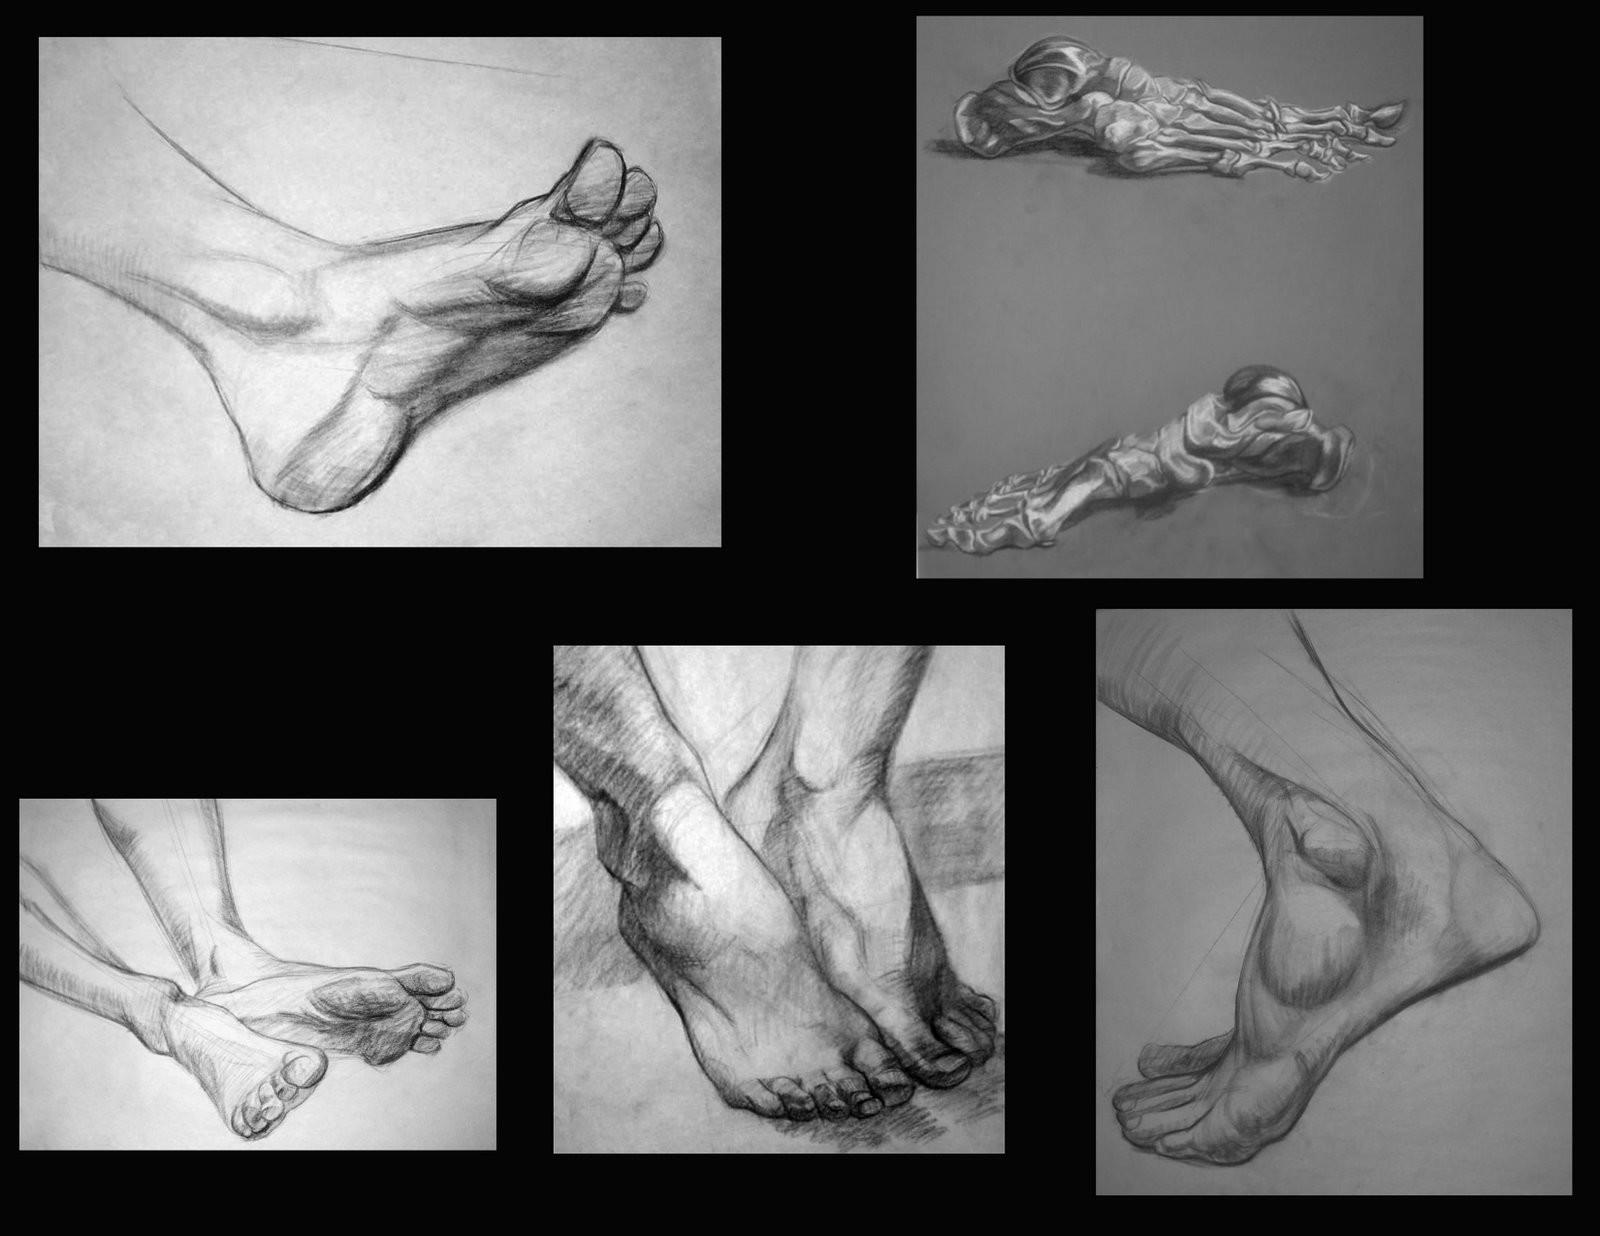 What's On Matt's Feet? [006] +